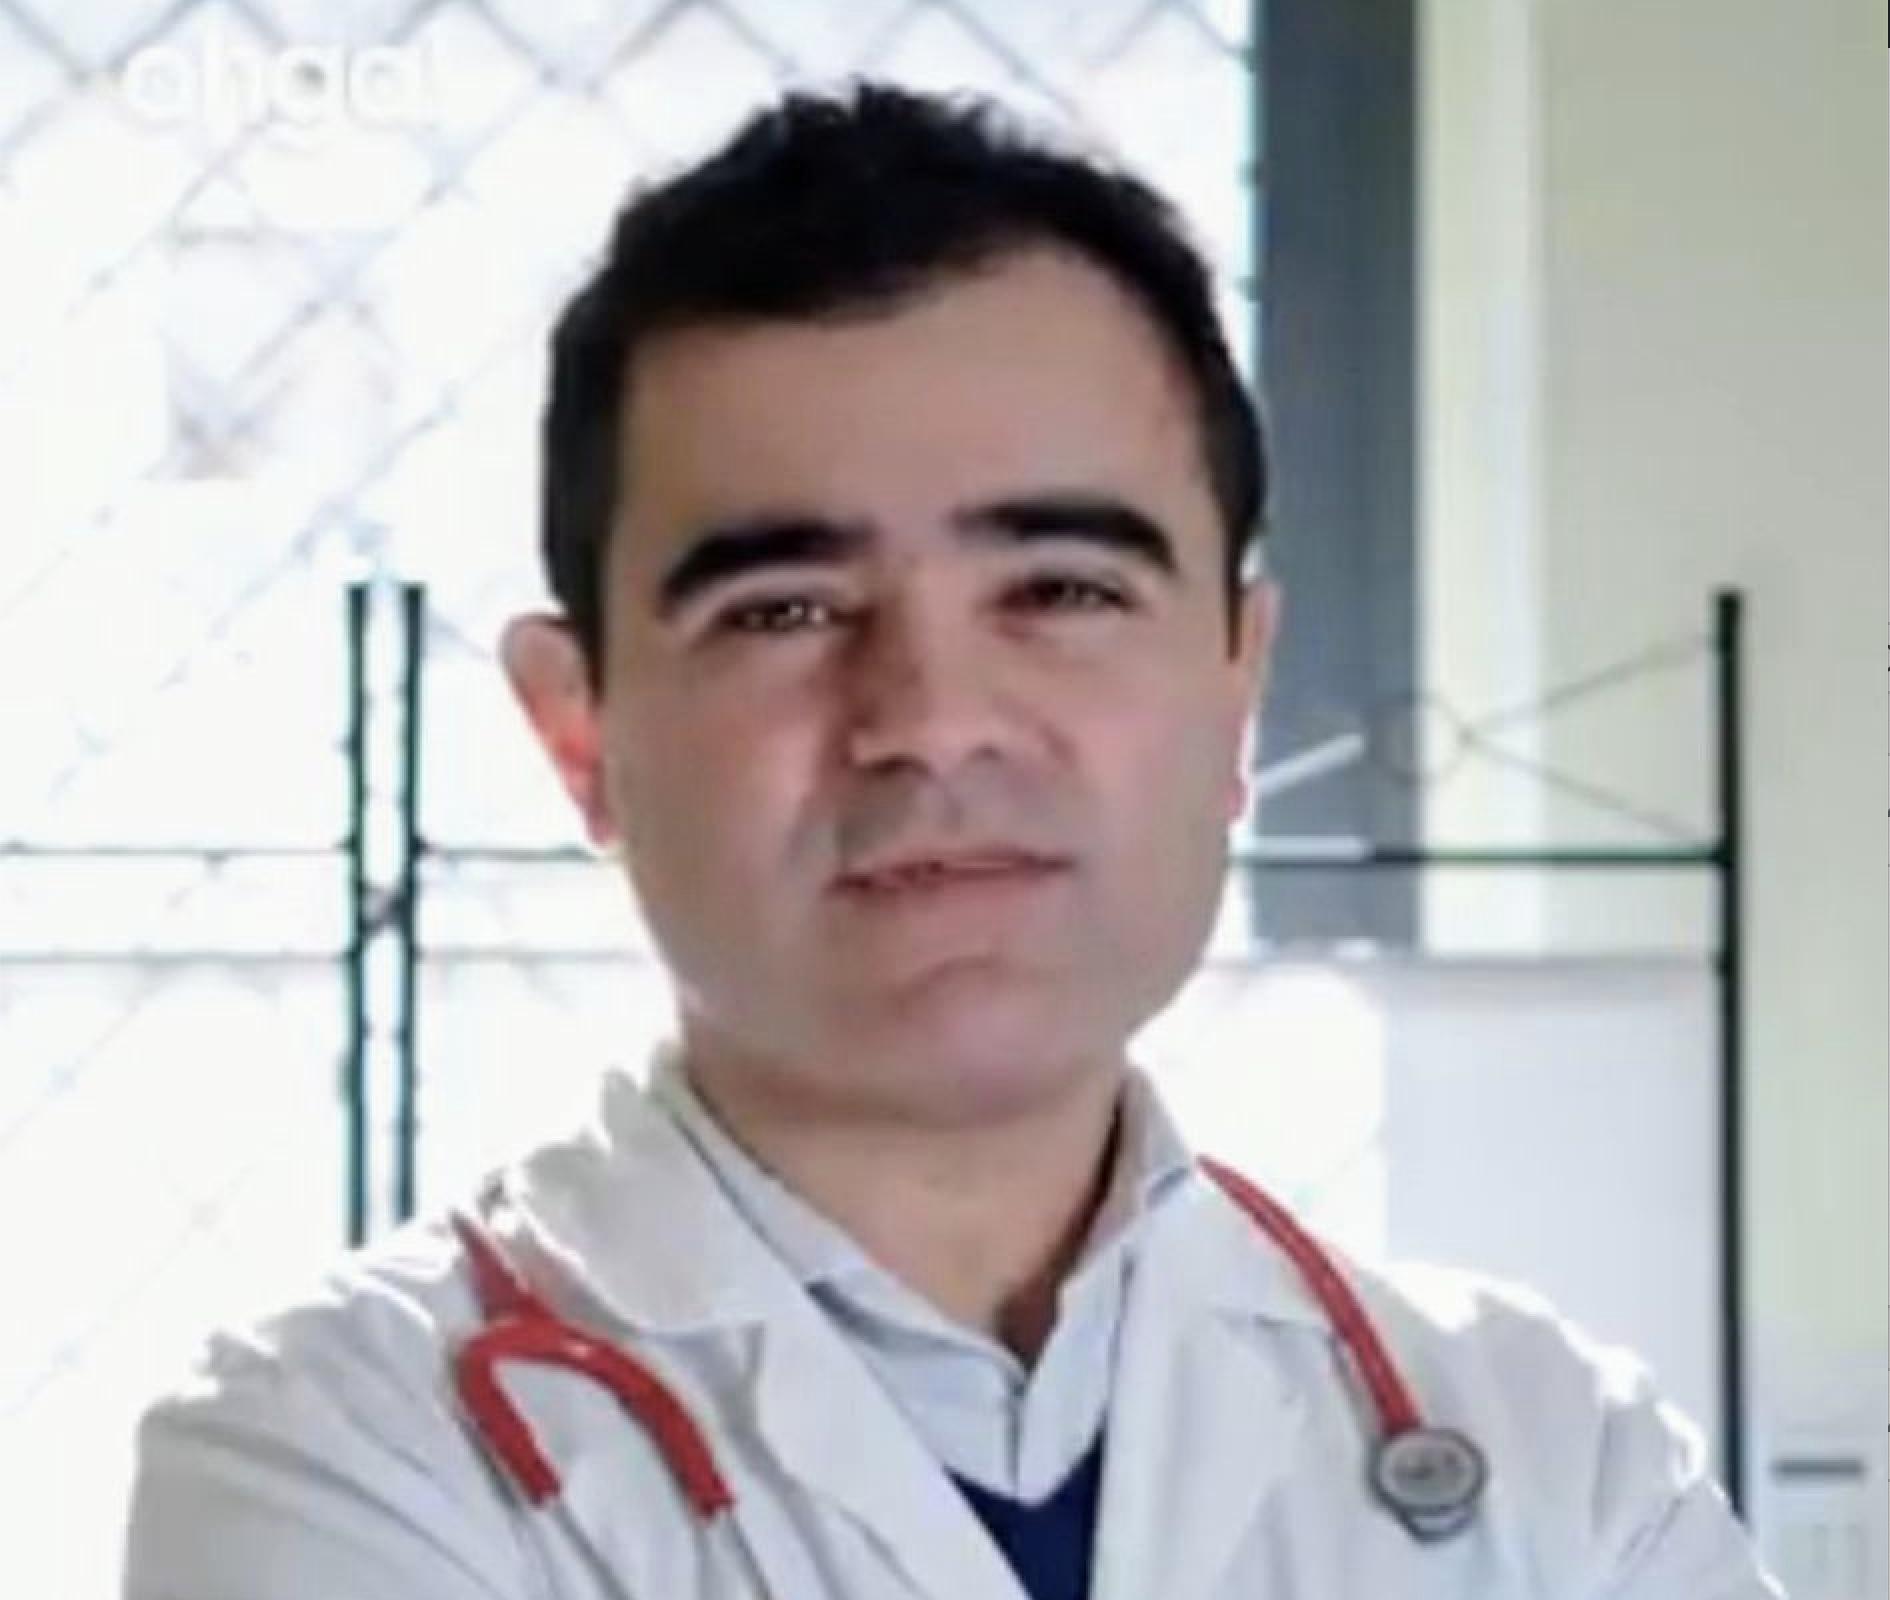 Dr. Stefano Mura